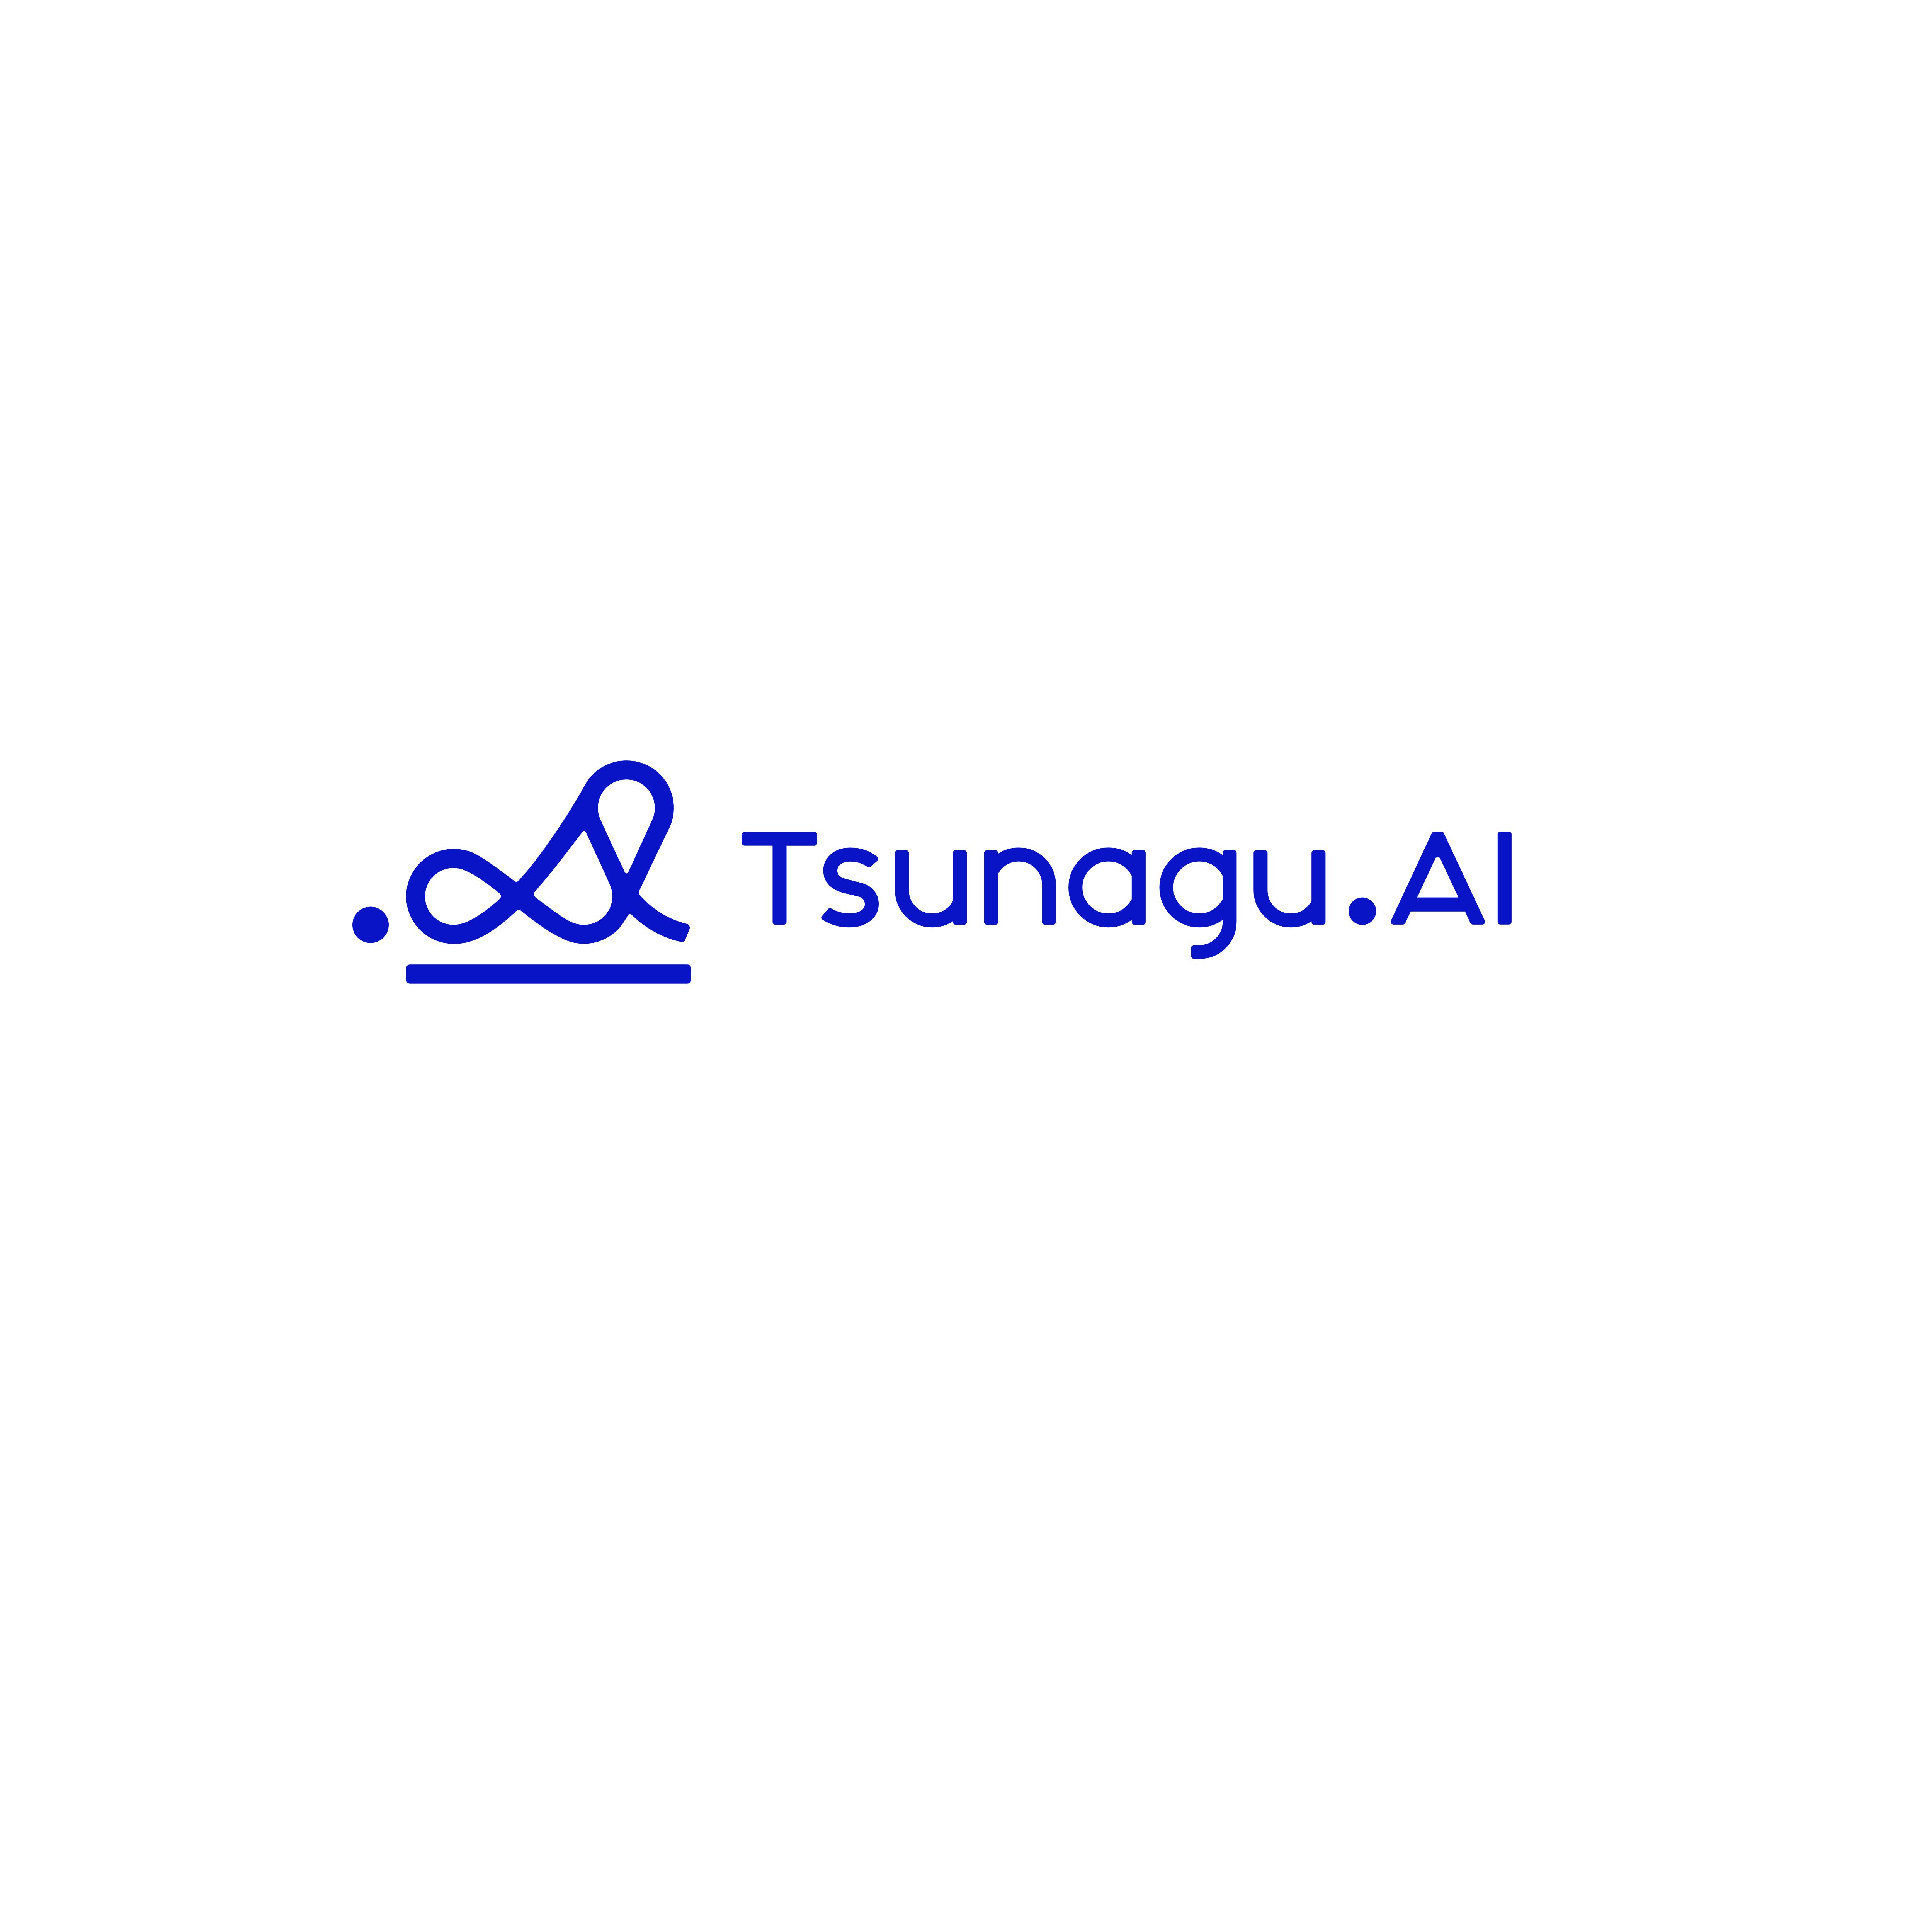 tsunagu-ai